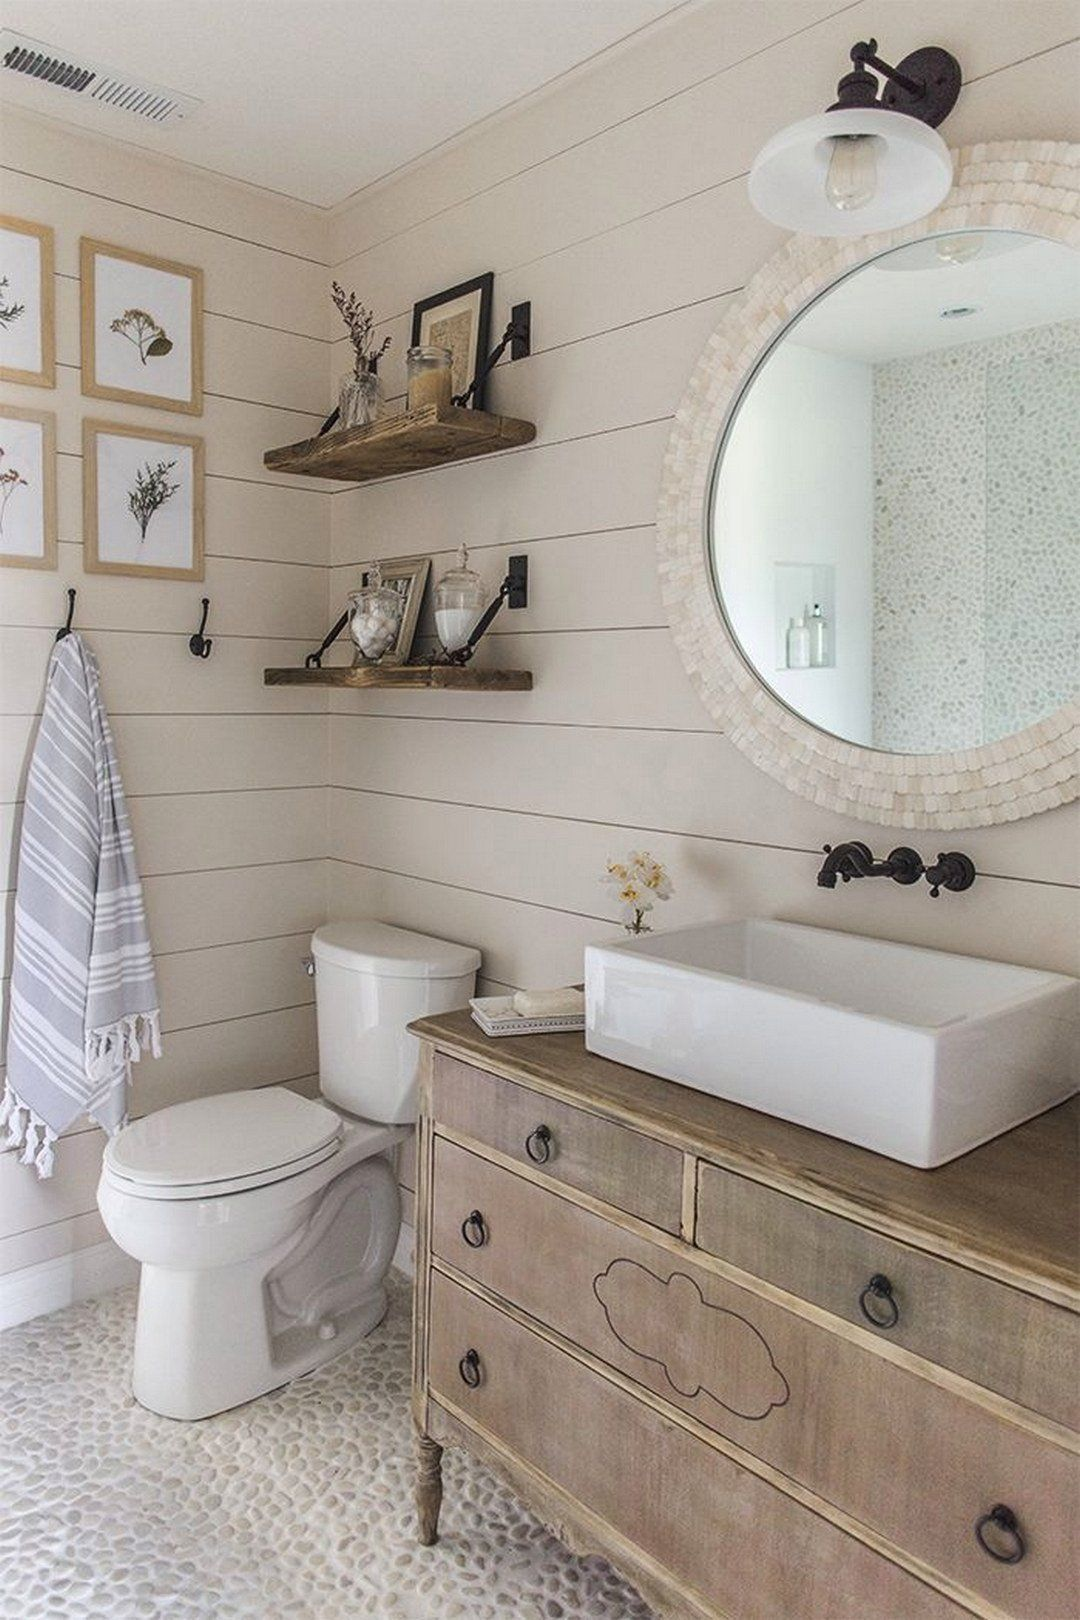 Bathroom Floor Tiles Ideas Bathroom Tiles Are An Easy Way To Update Your Bathro Modern Farmhouse Bathroom Farmhouse Master Bathroom Farmhouse Bathroom Vanity